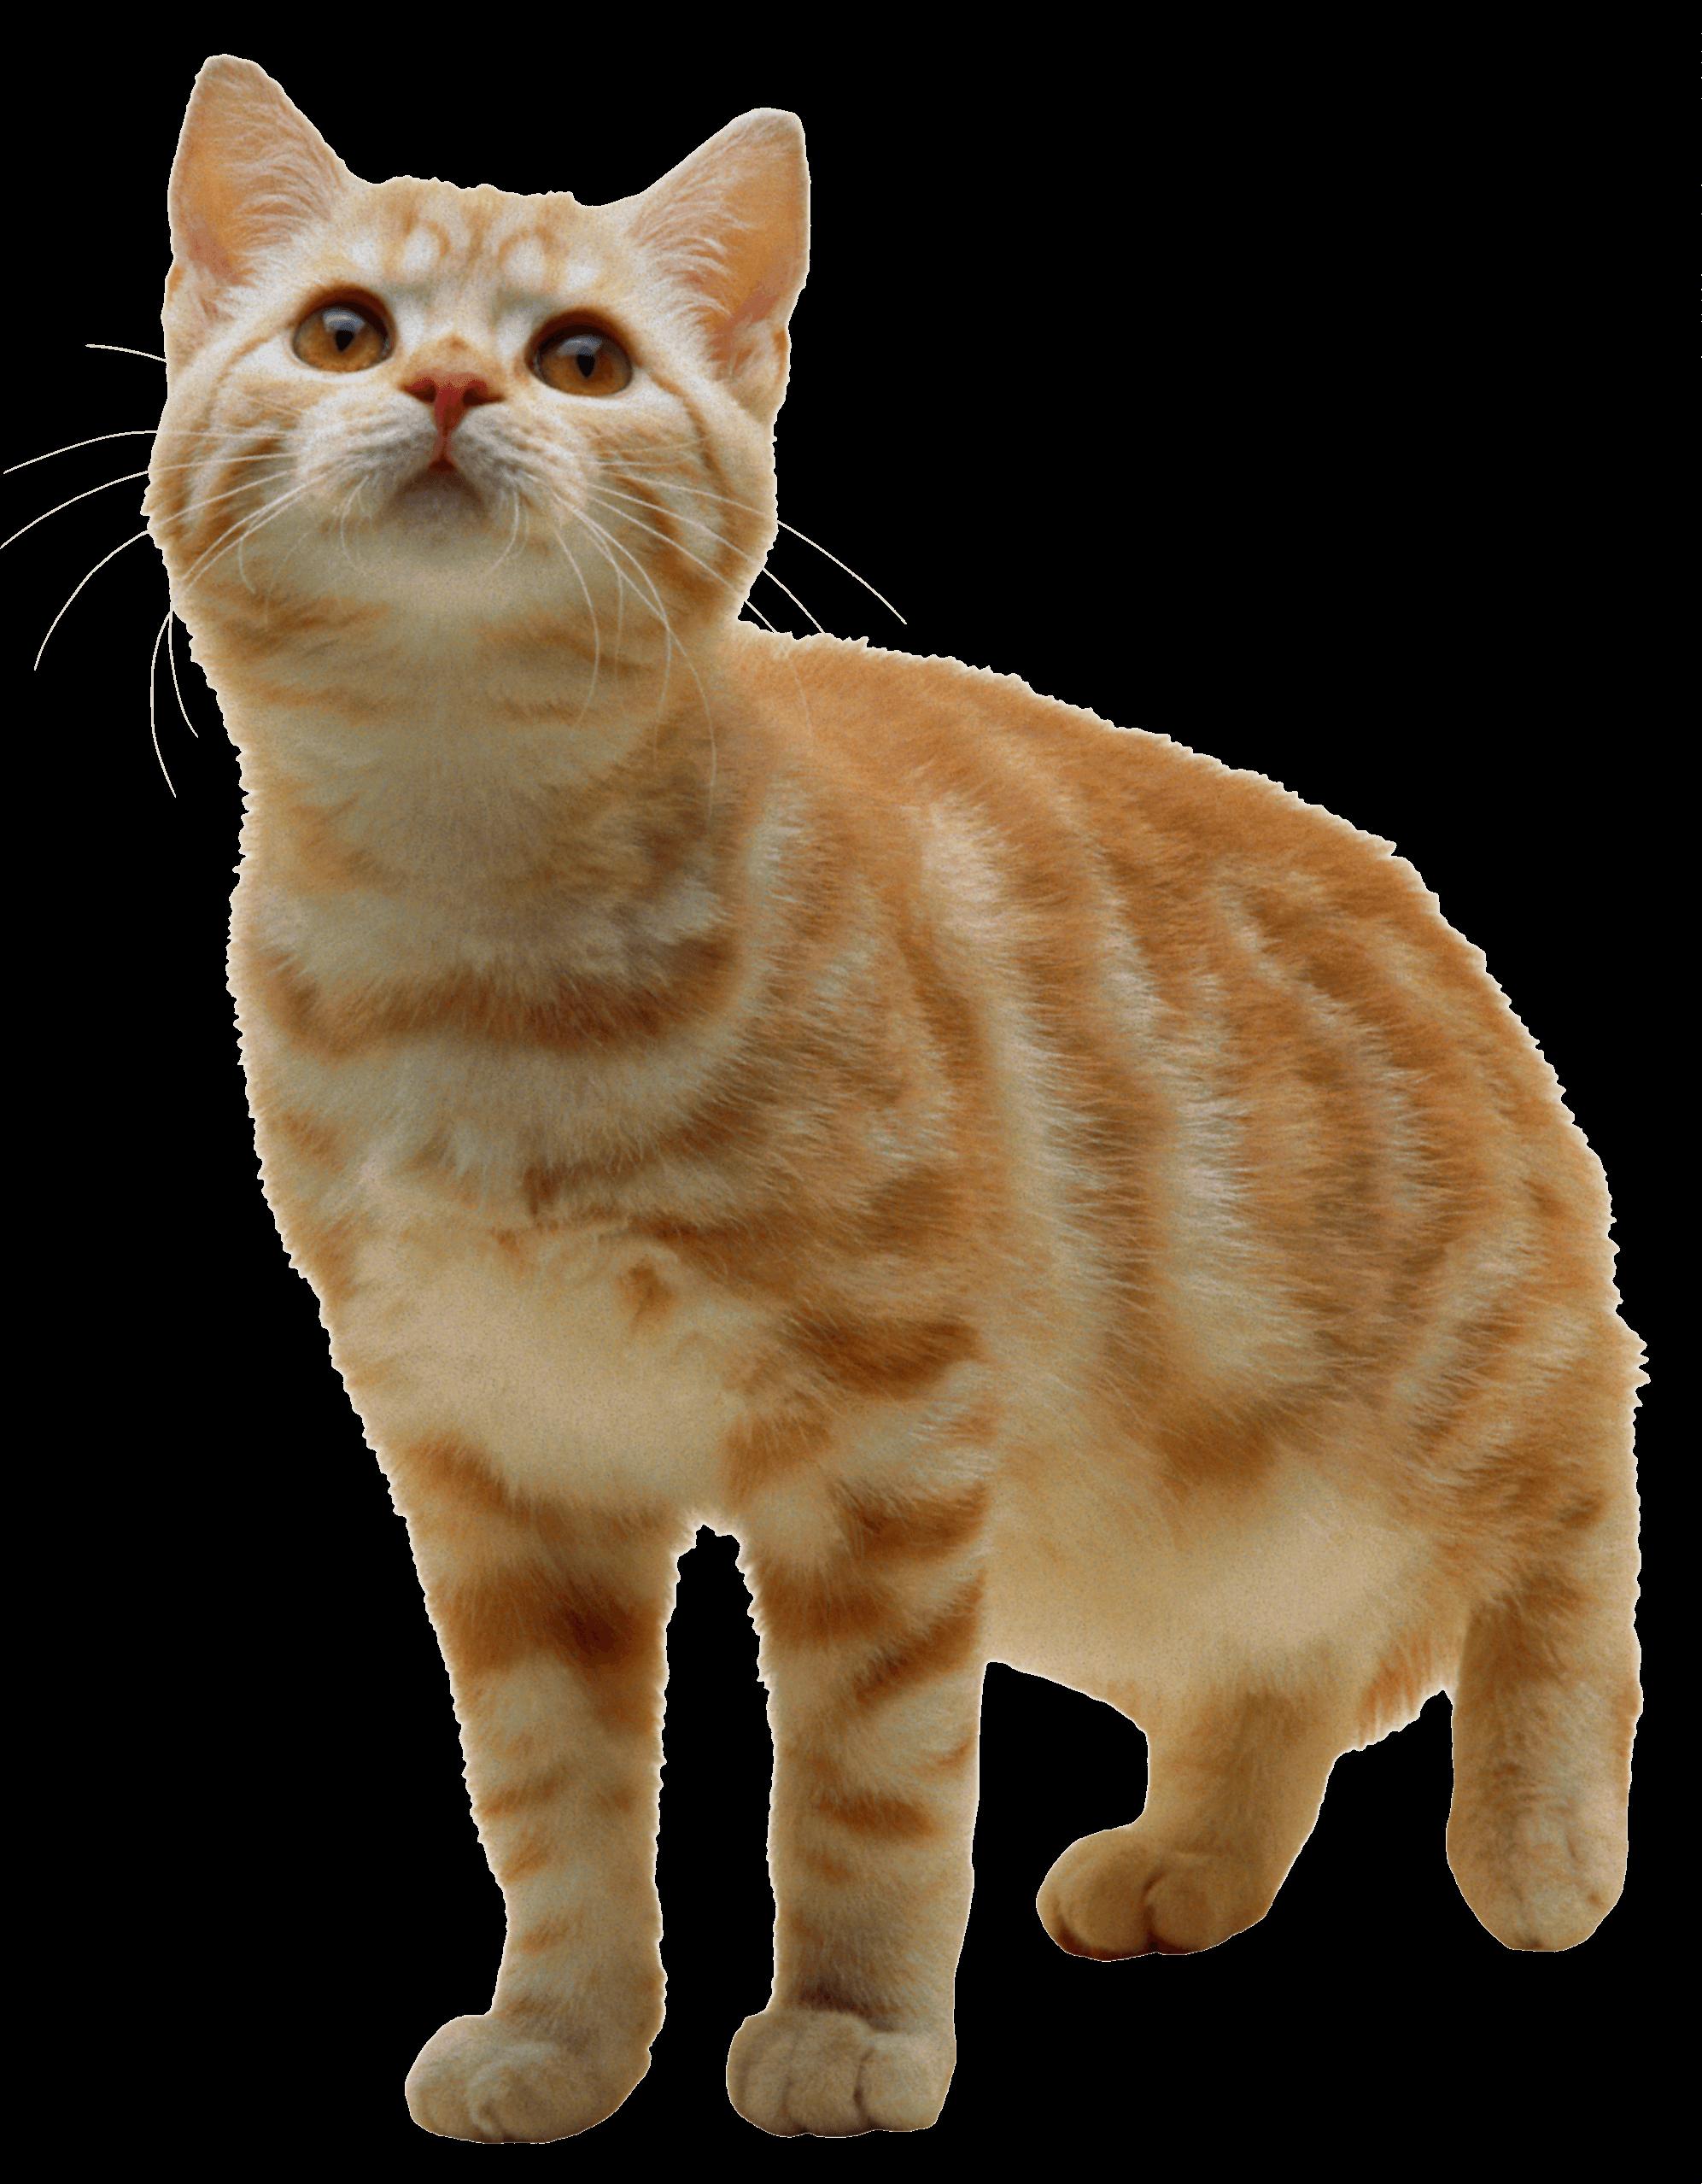 Sweet Cat Kitten PNG PNG Image